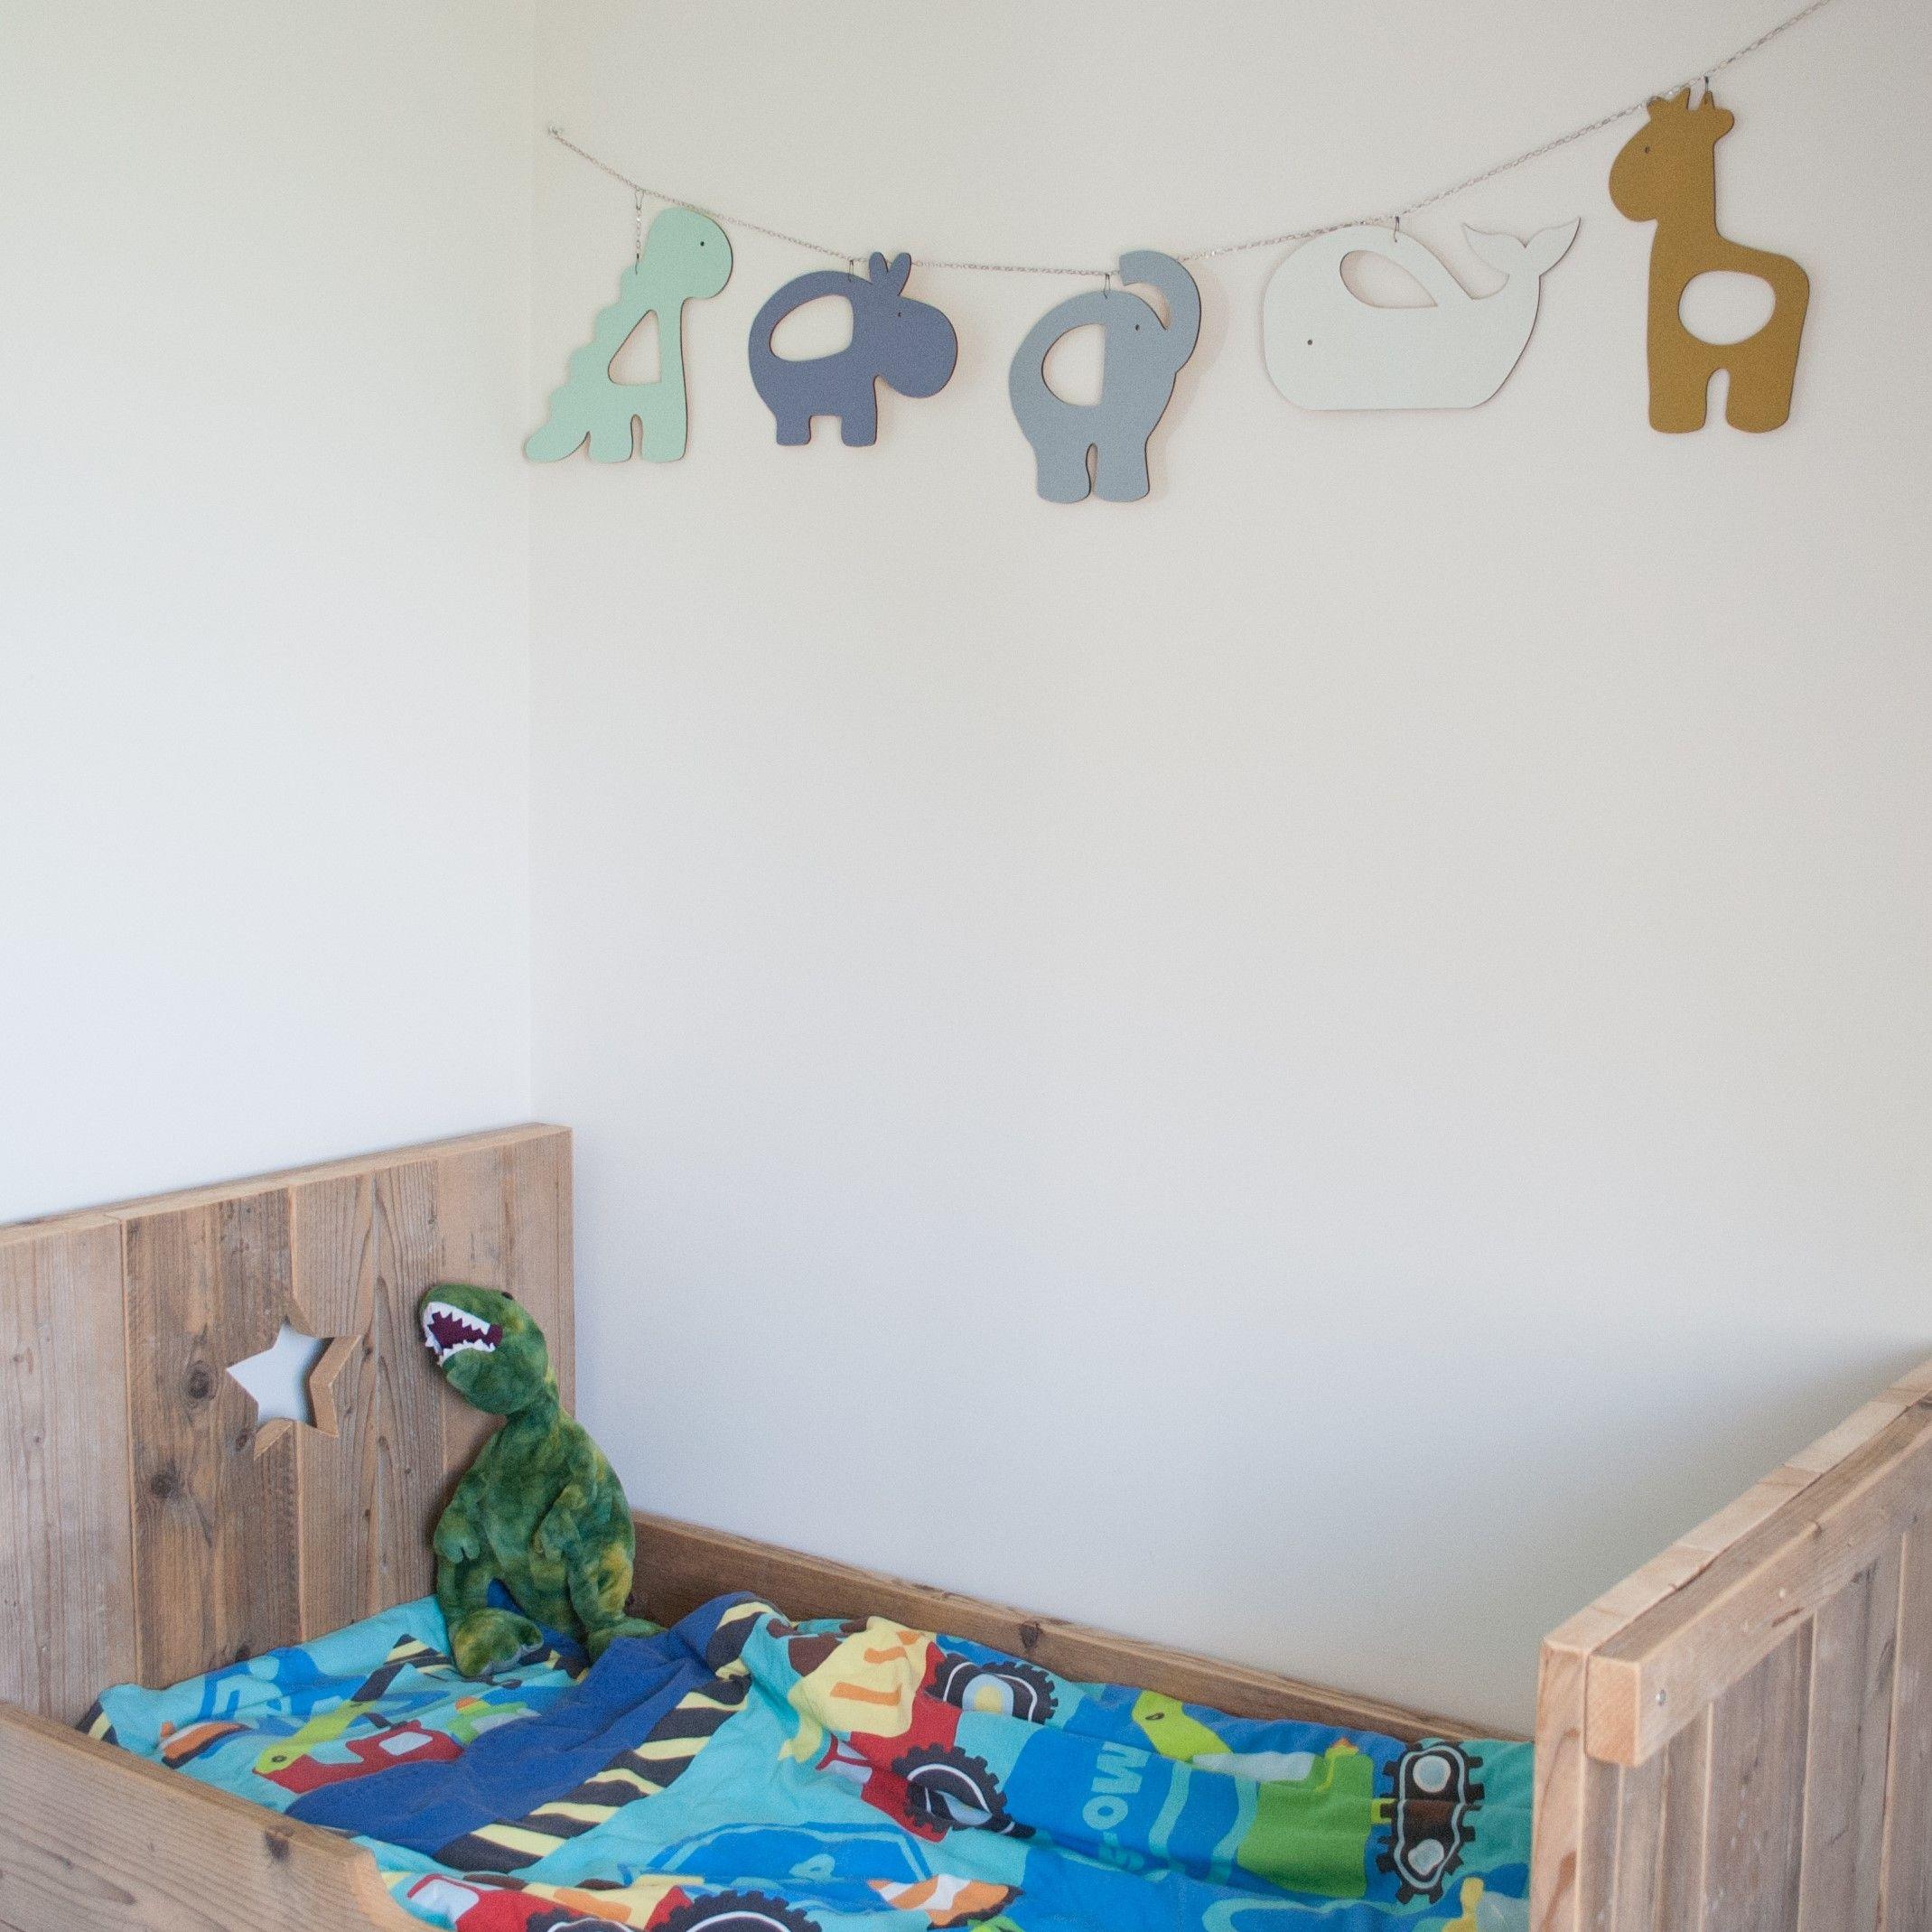 Muurdecoratie Hout Kinderkamer.Houten Slinger Wildlife Walvis Dino Giraffe Olifant En